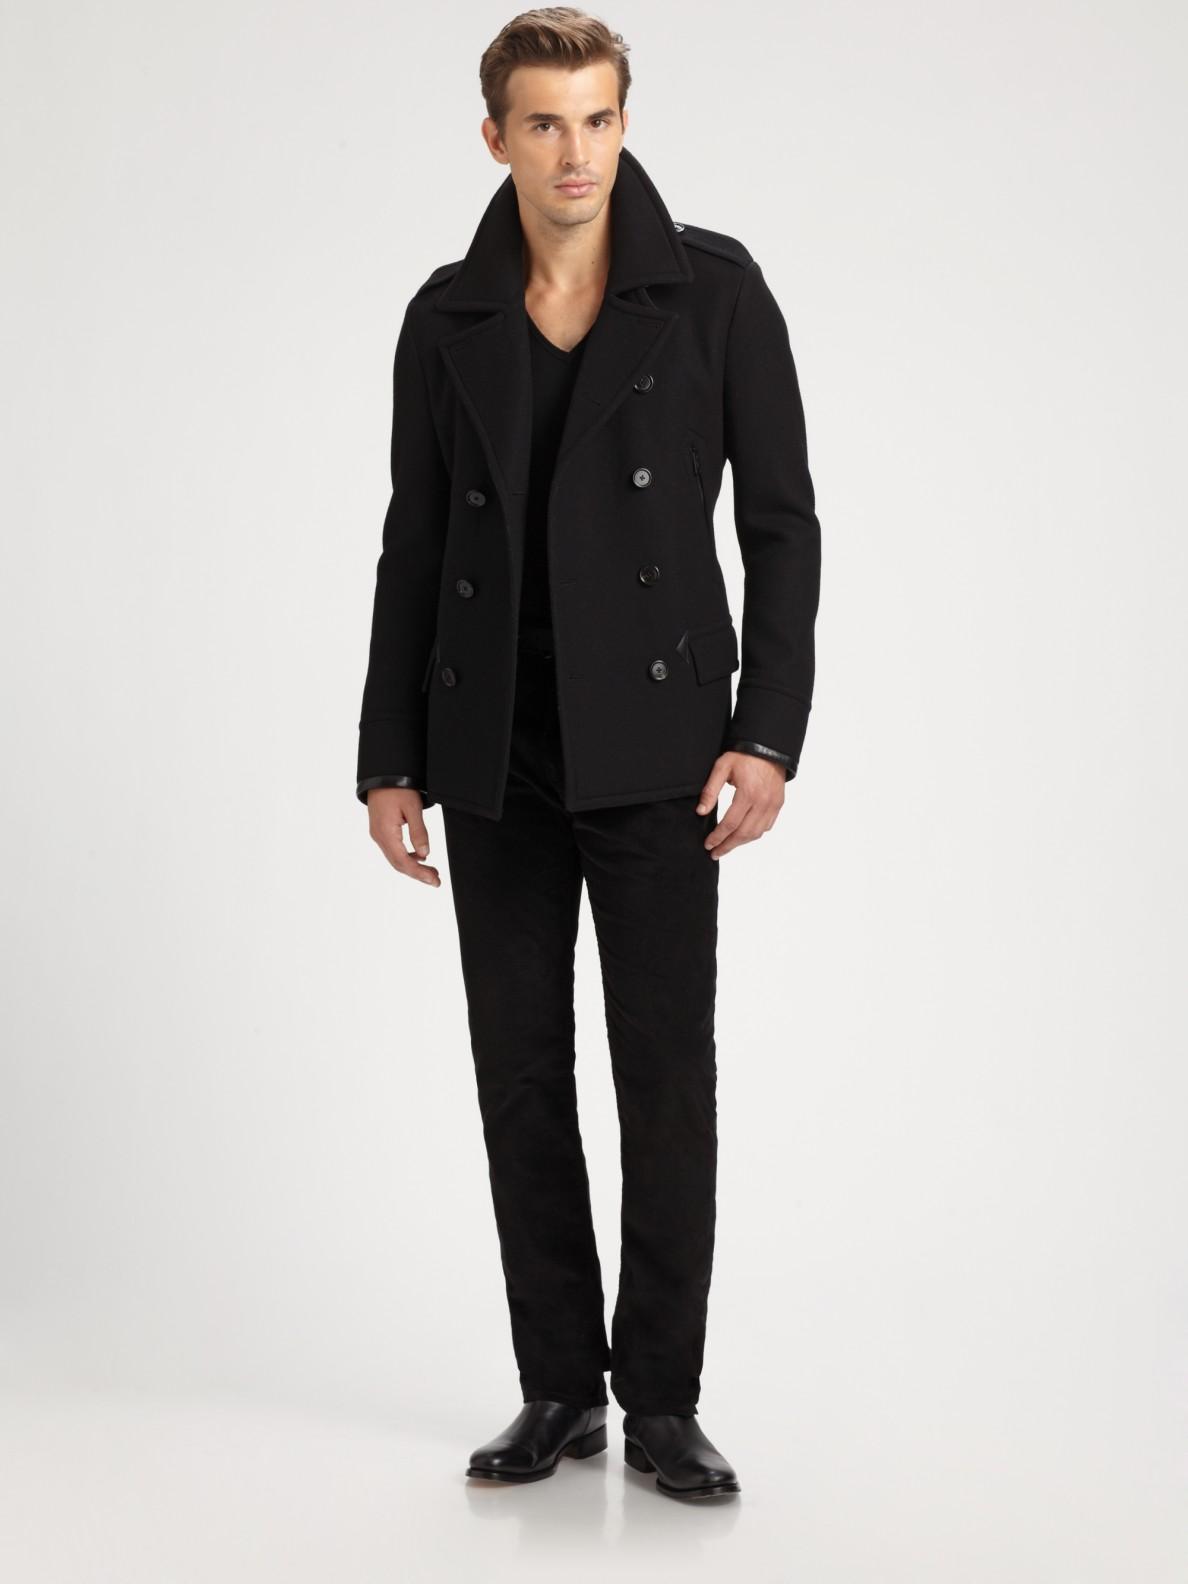 Ralph lauren black label Leathertrimmed Modern Peacoat in Black ...